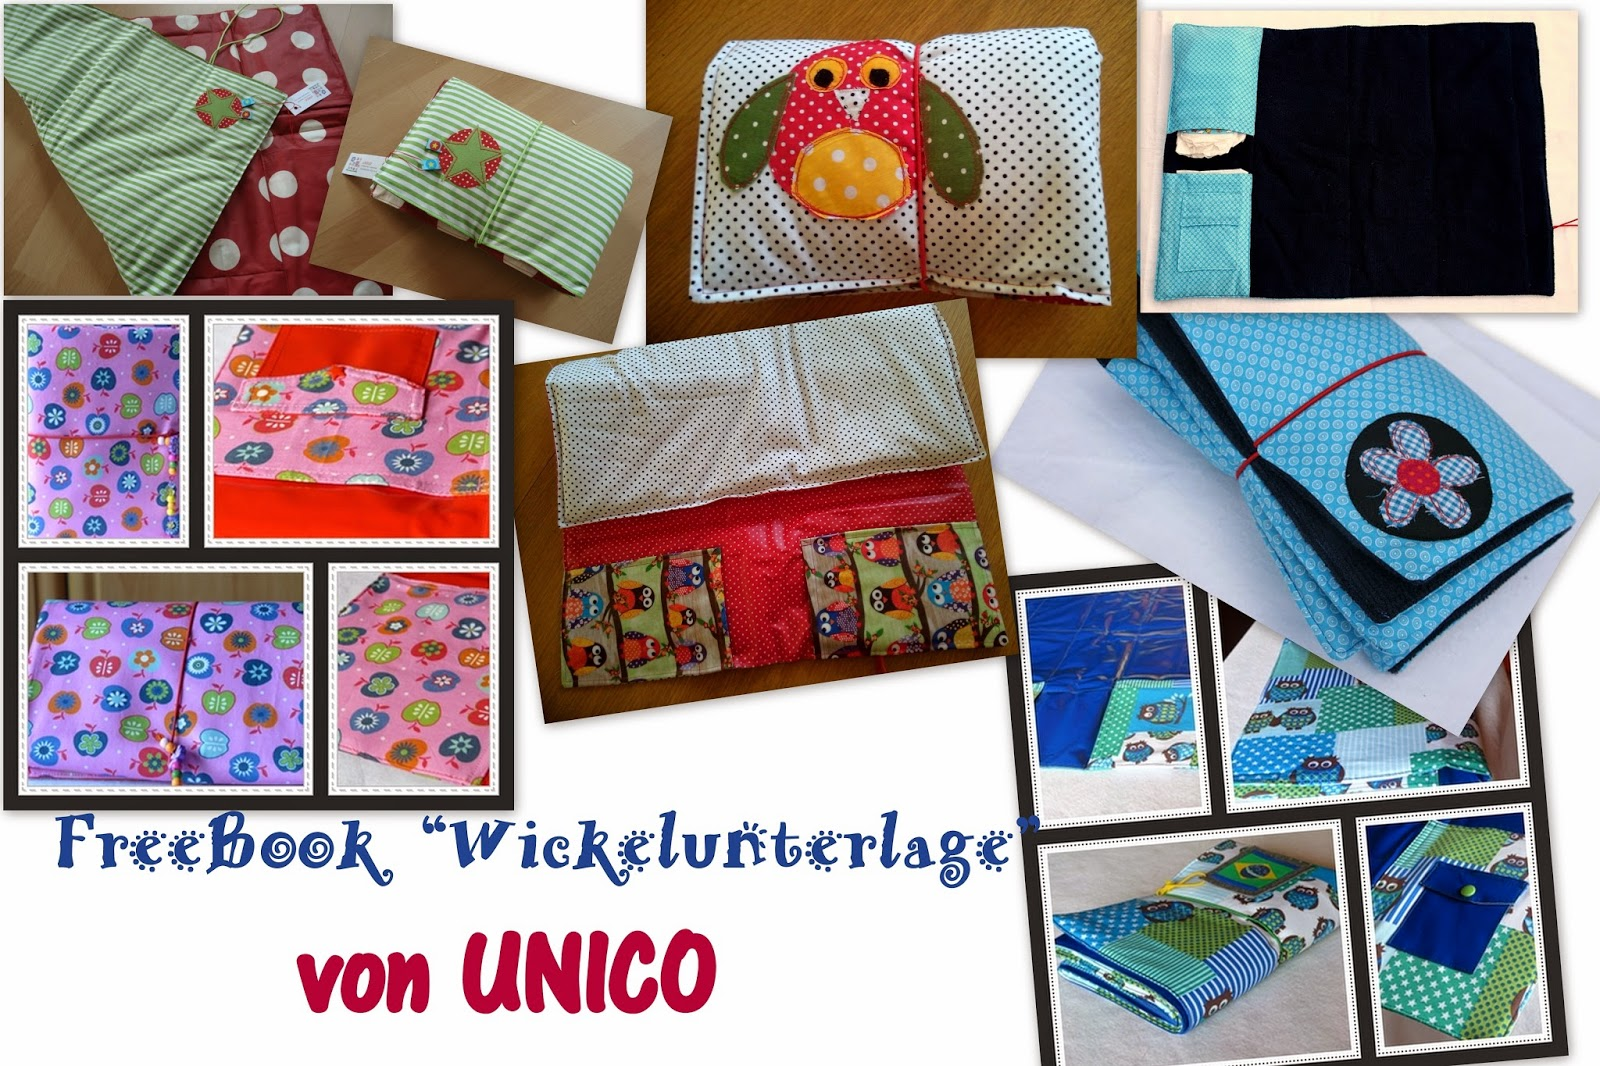 http://www.farbenmix.de/shop/Neues/Wickelunterlage-Kreativ-FREEbook::11998.html?XTCsid=fq4gnrcpk5qf3bf8mcfb86gpu5